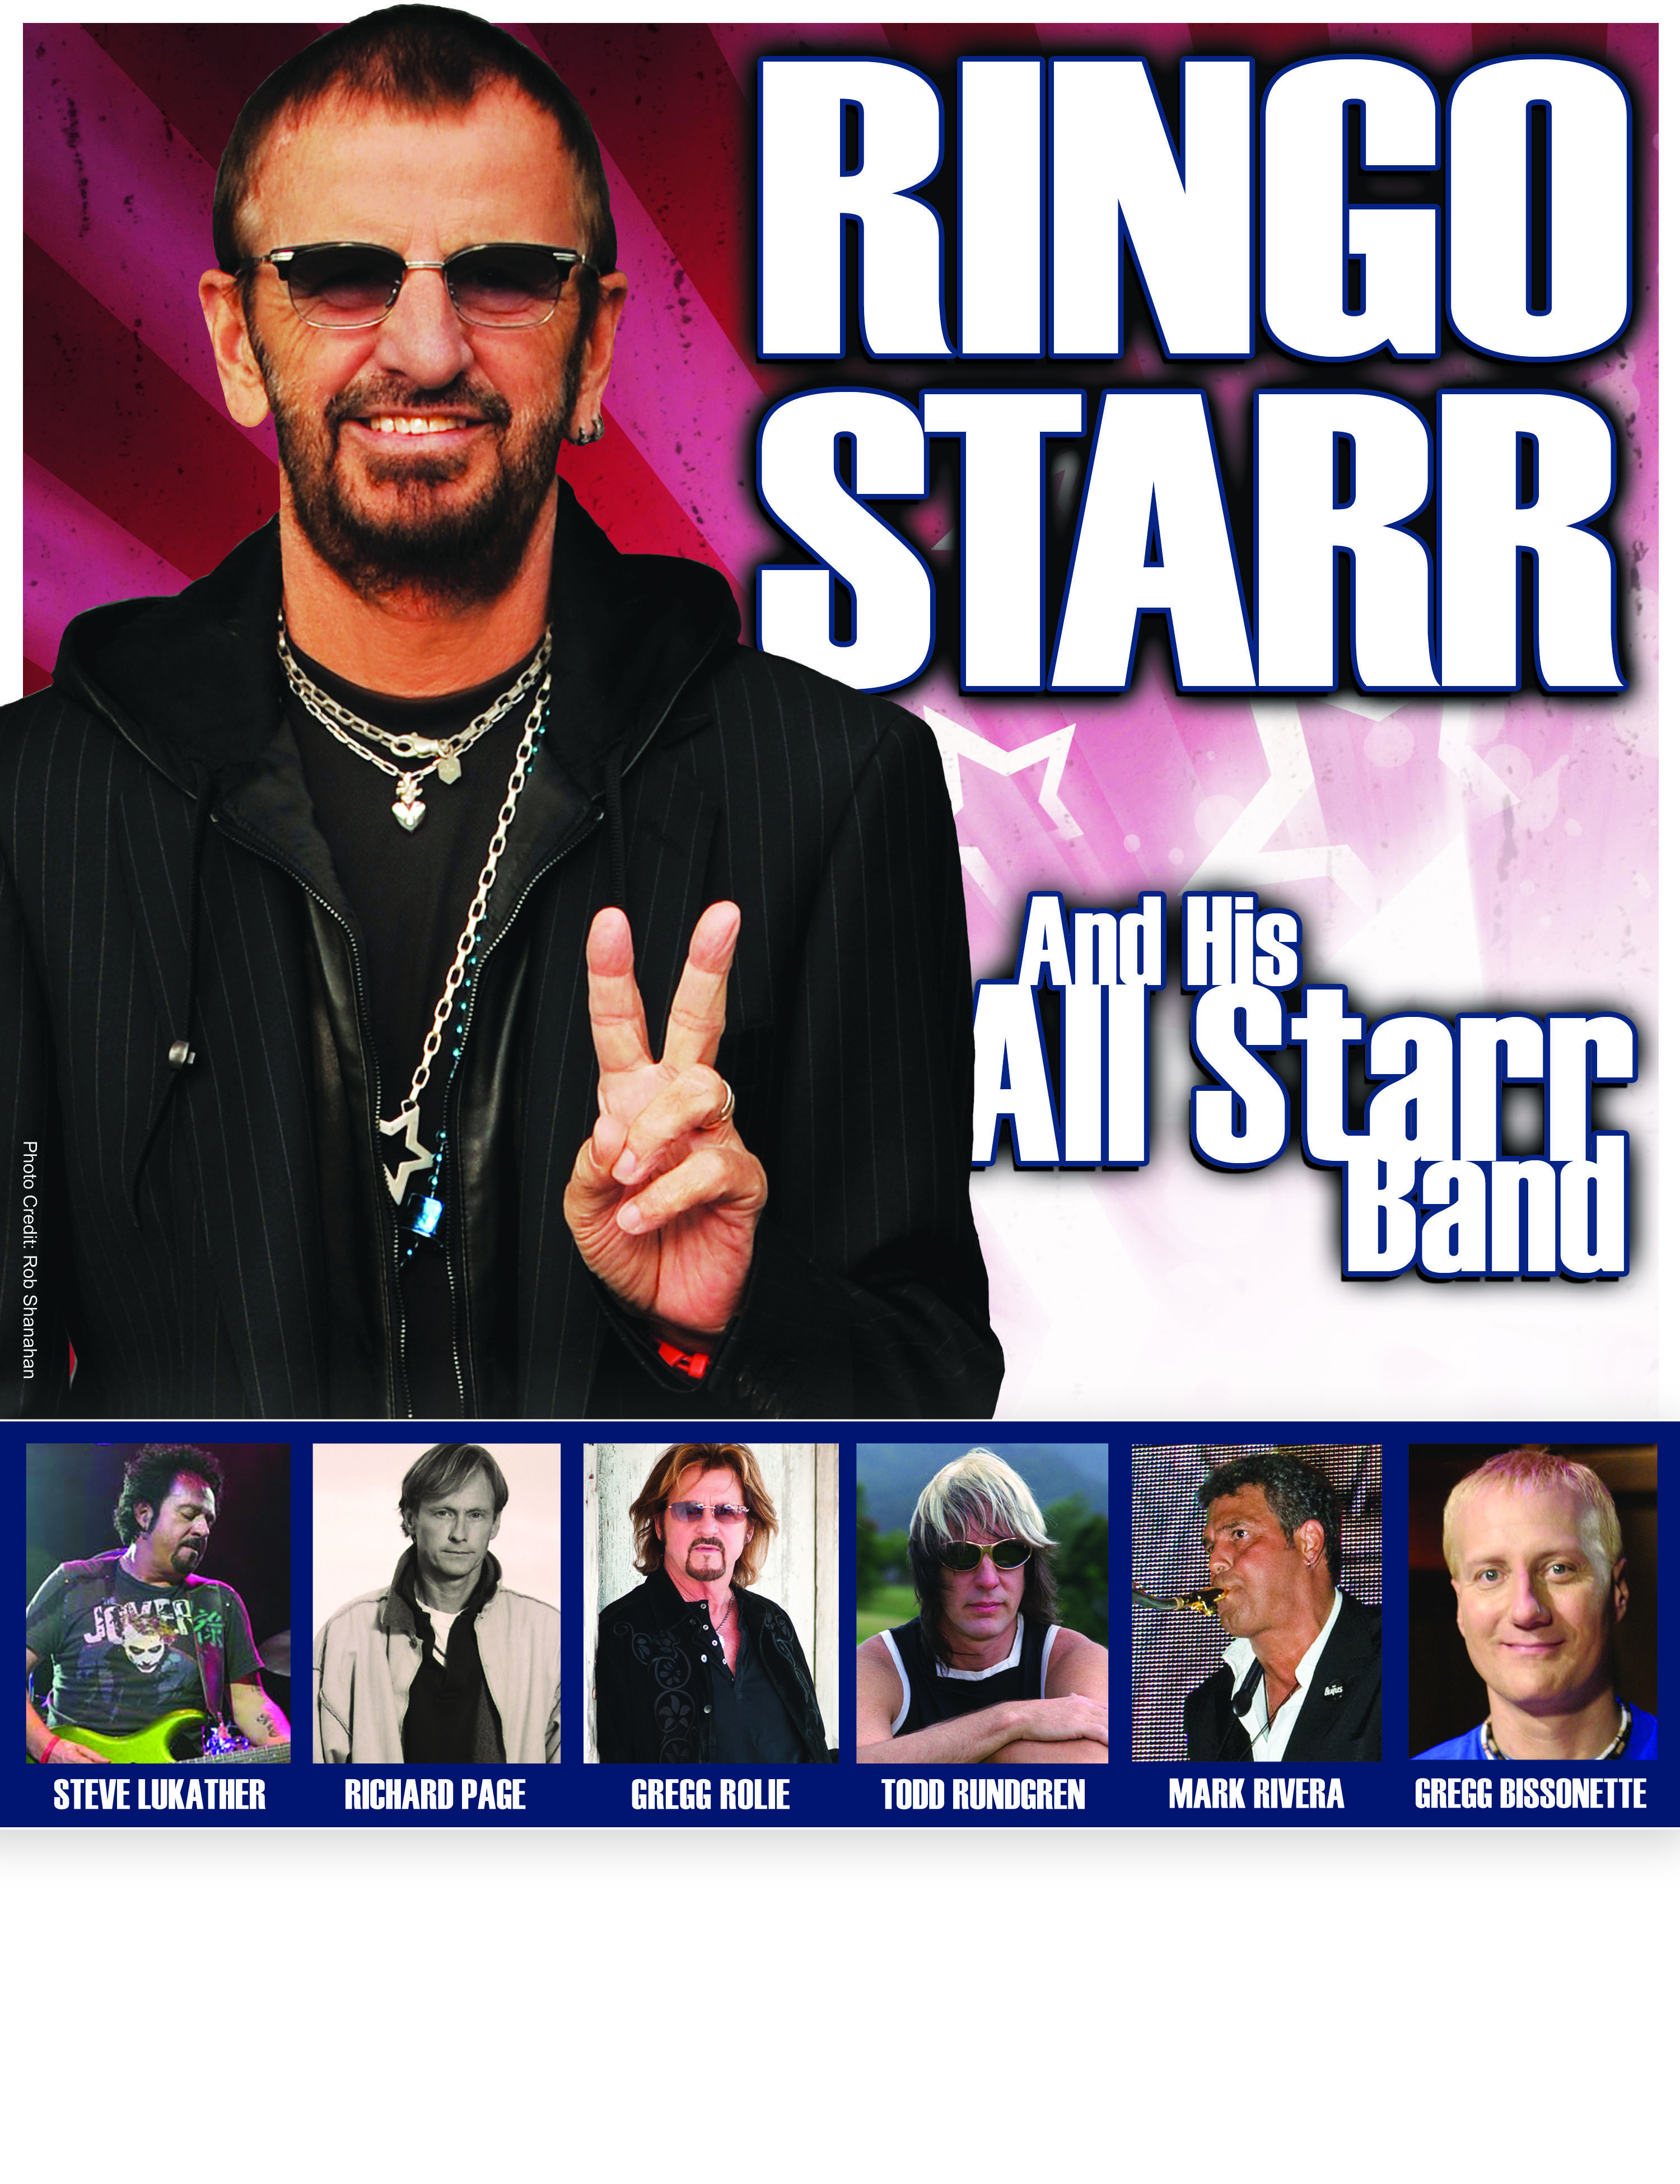 Ringo Starr and his All Starr Band, 13 de noviembre, Auditorio Nacional, Ciudad de México #RingoStarrMx